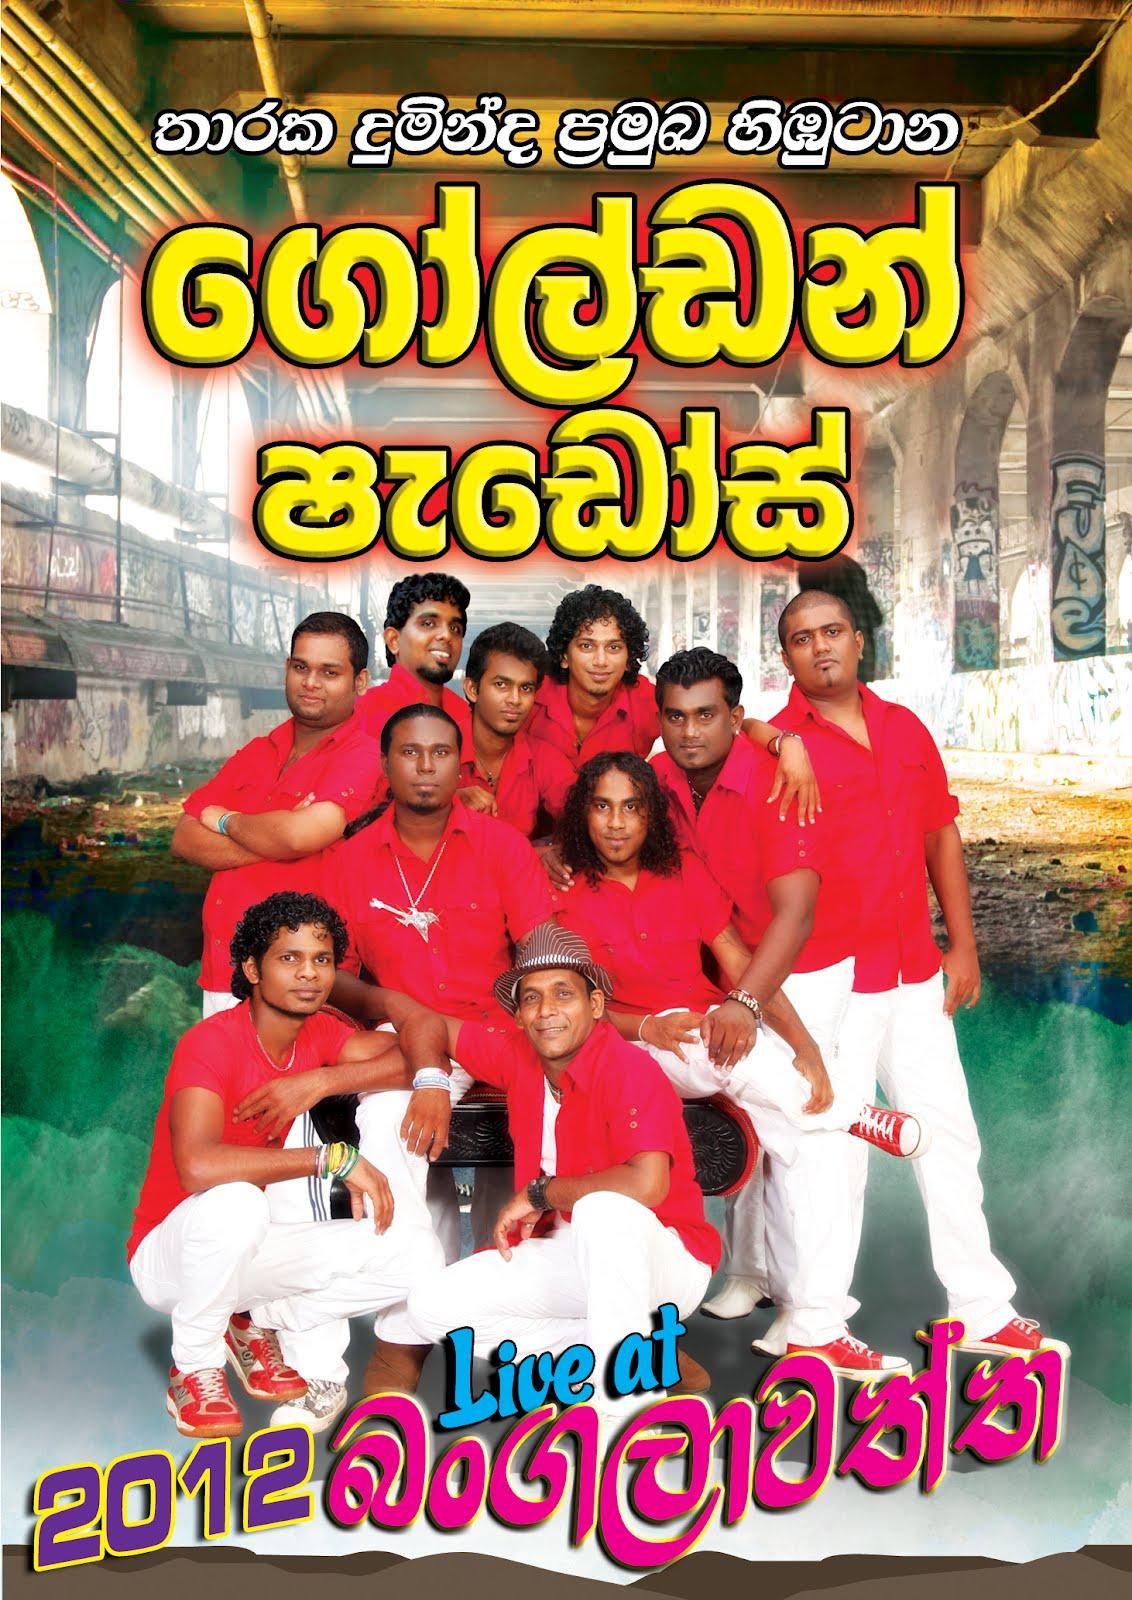 http://4.bp.blogspot.com/-8CpcnSDSZ0w/T9bdcQqCZrI/AAAAAAAADKw/imY1VIJfk5Q/s1600/2012%2BBangalawaththa.jpg